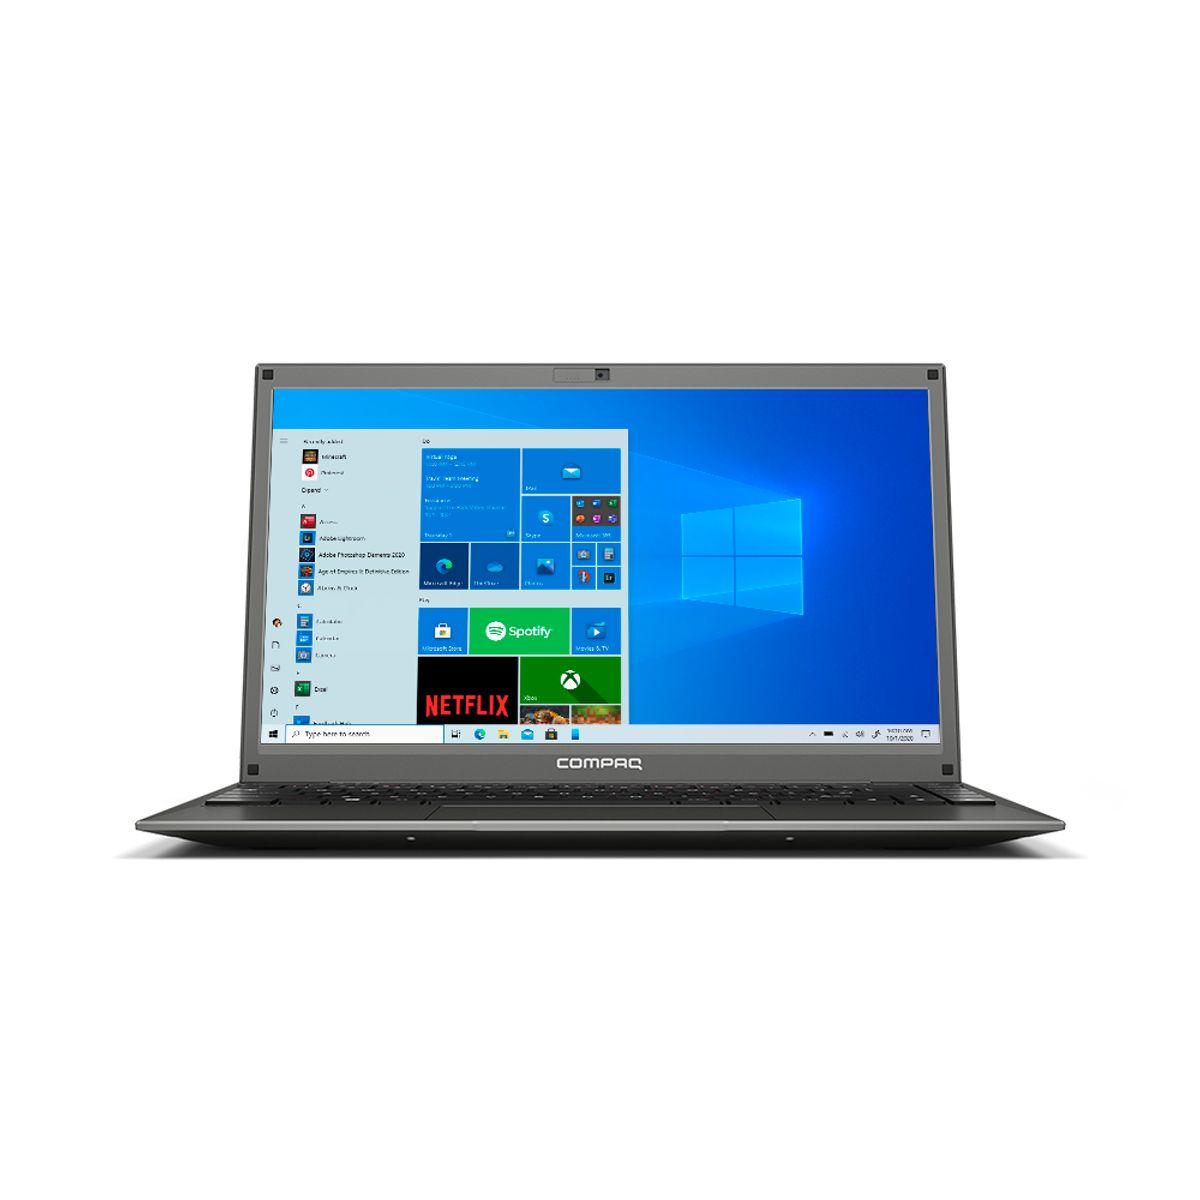 NOTEBOOK COMPAQ PRESARIO 420 INTEL PENTIUM-N3700, 4GB RAM, 120GB SSD, WINDOWS 10, 14,1? CINZA